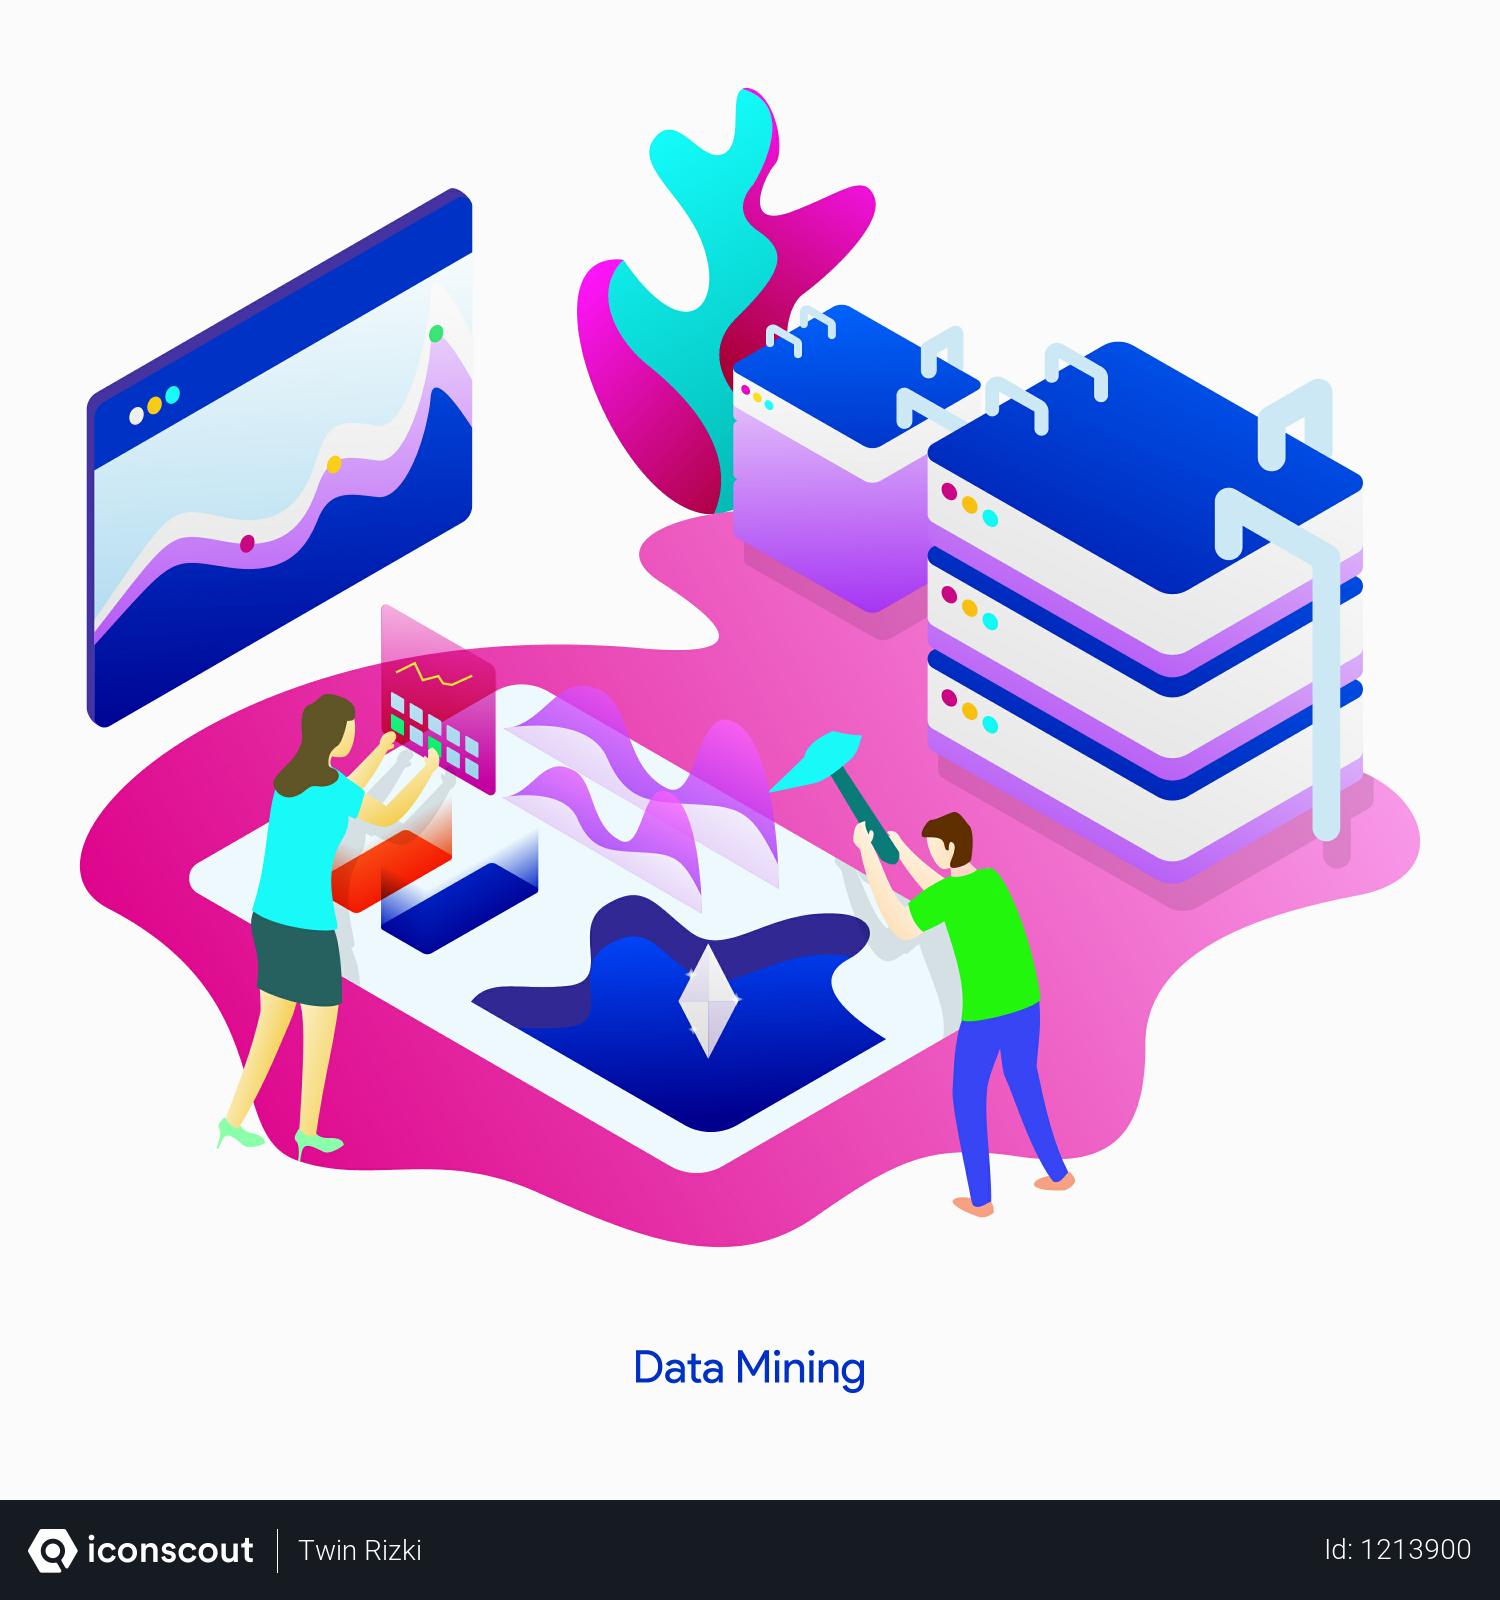 Premium Data Mining Illustration download in PNG & Vector